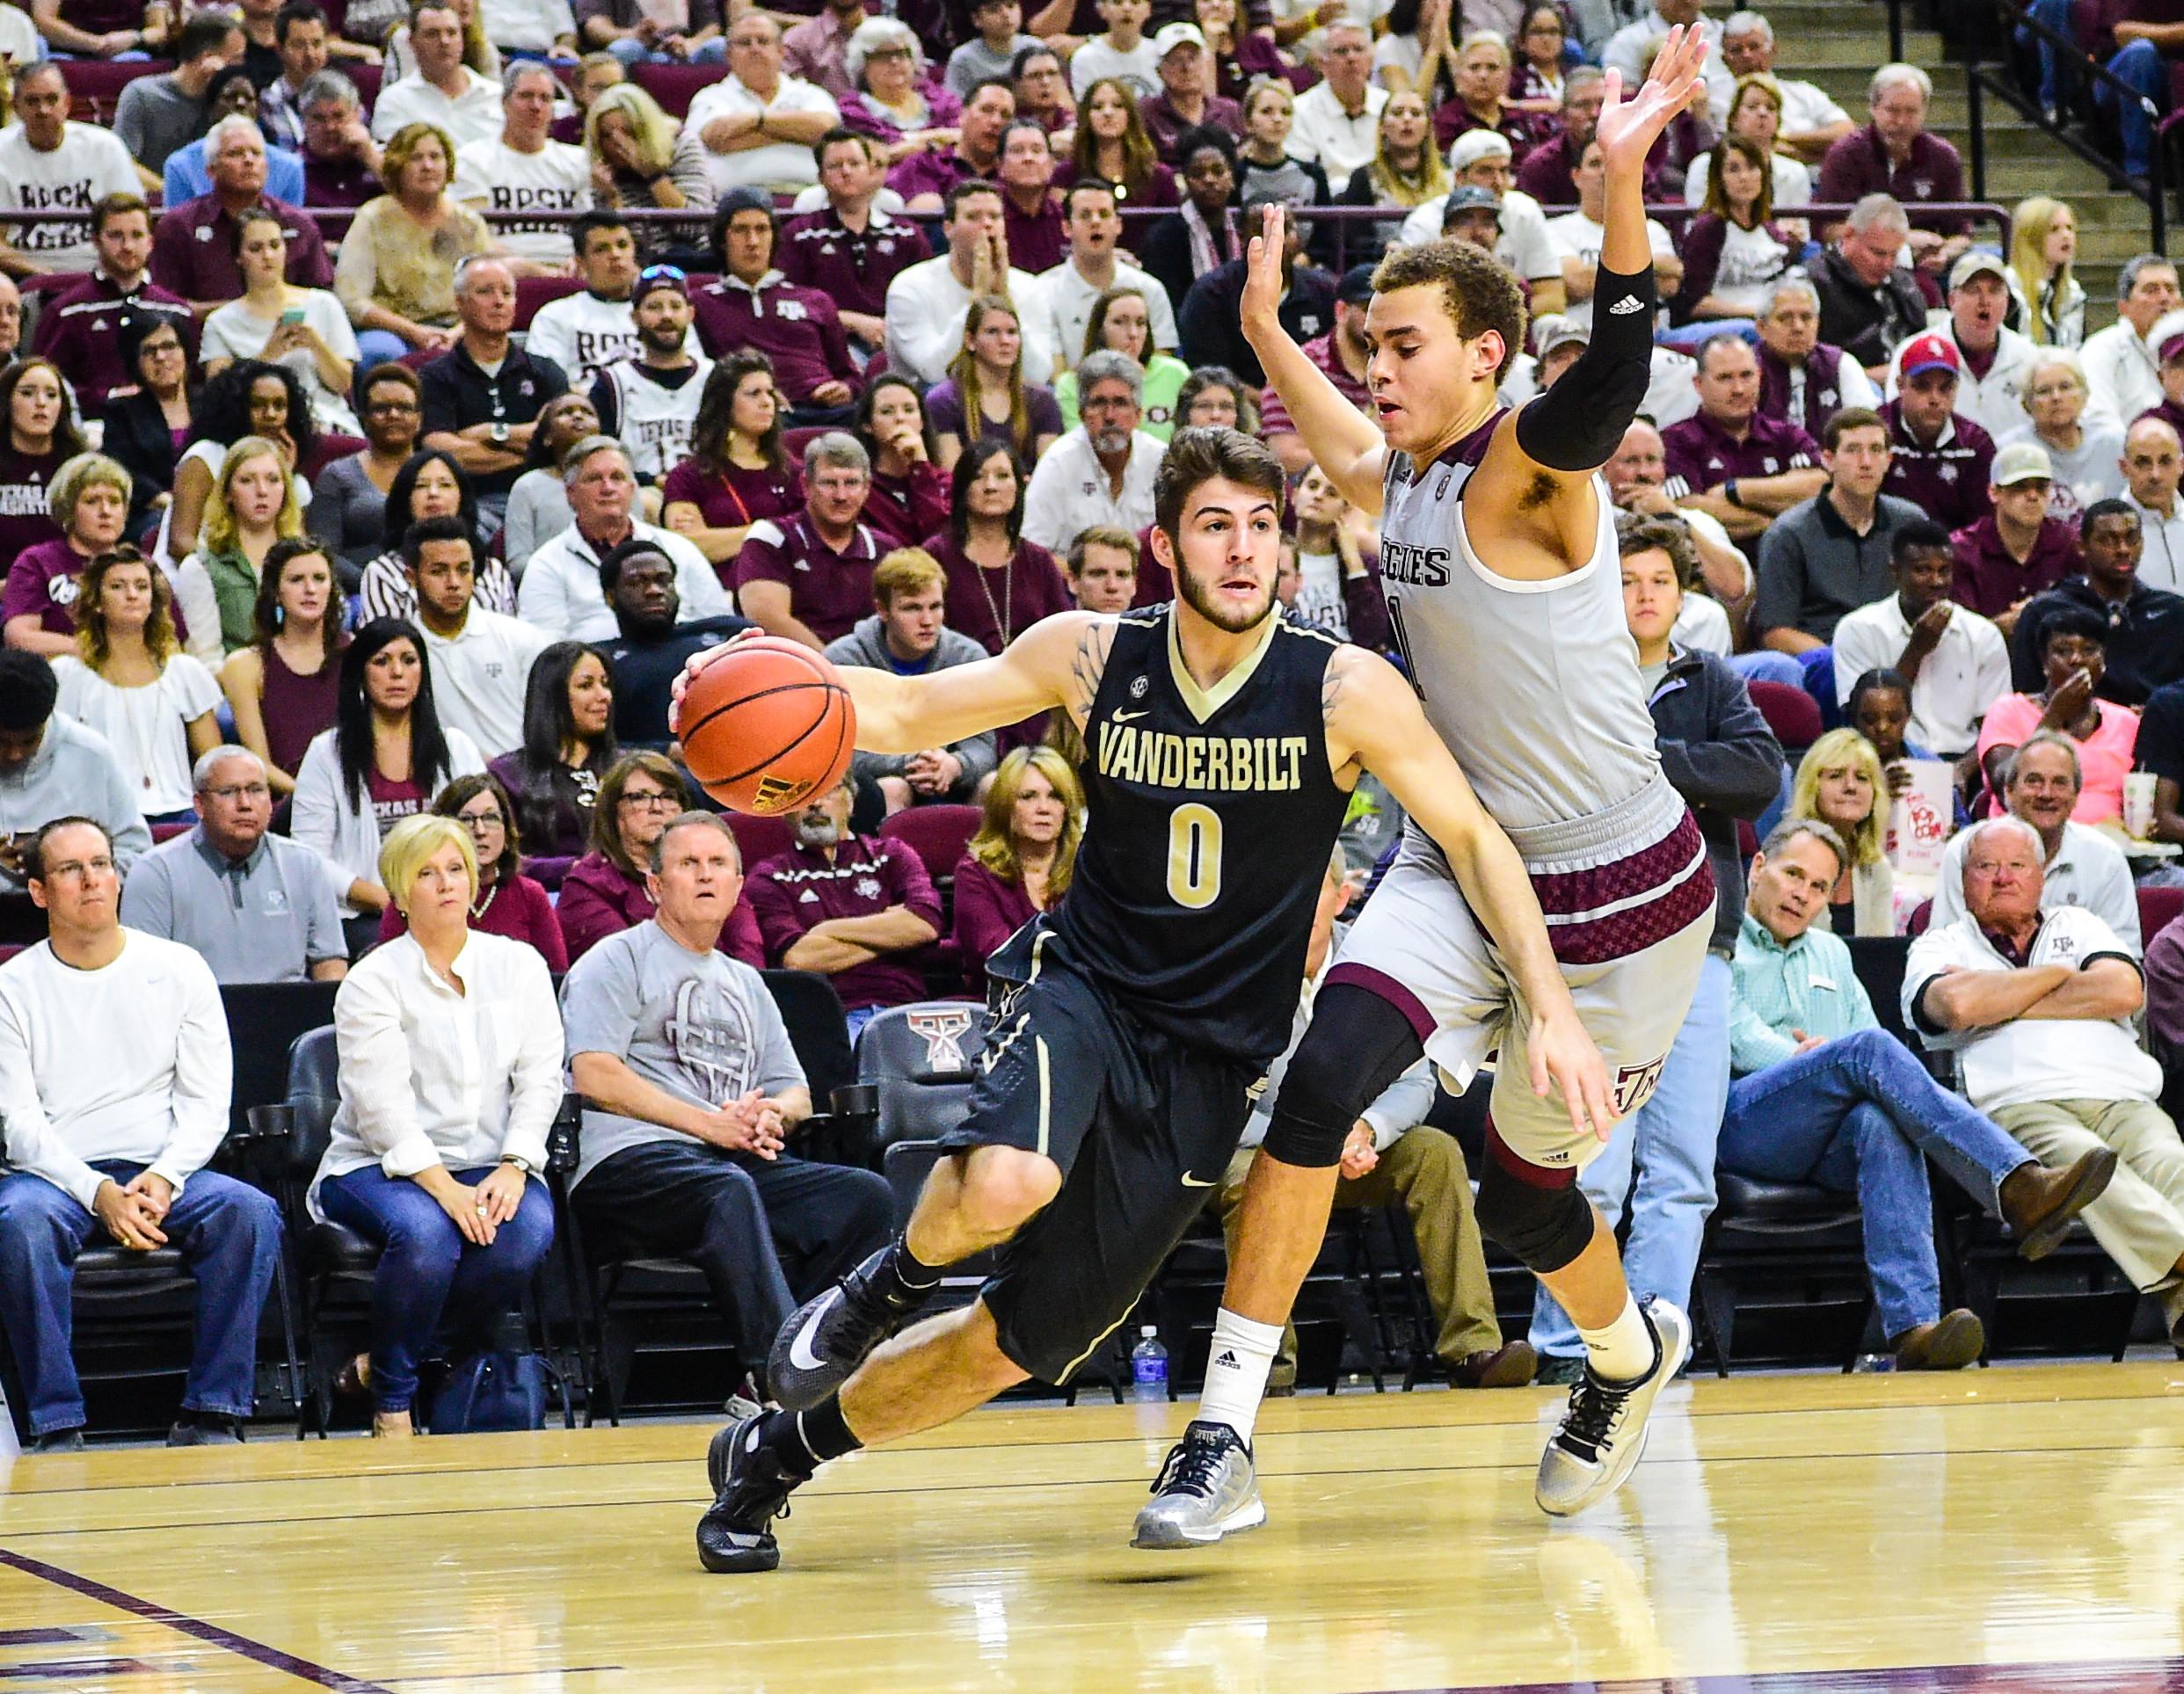 NCAA BASKETBALL: MAR 05 Vanderbilt at Texas A&M